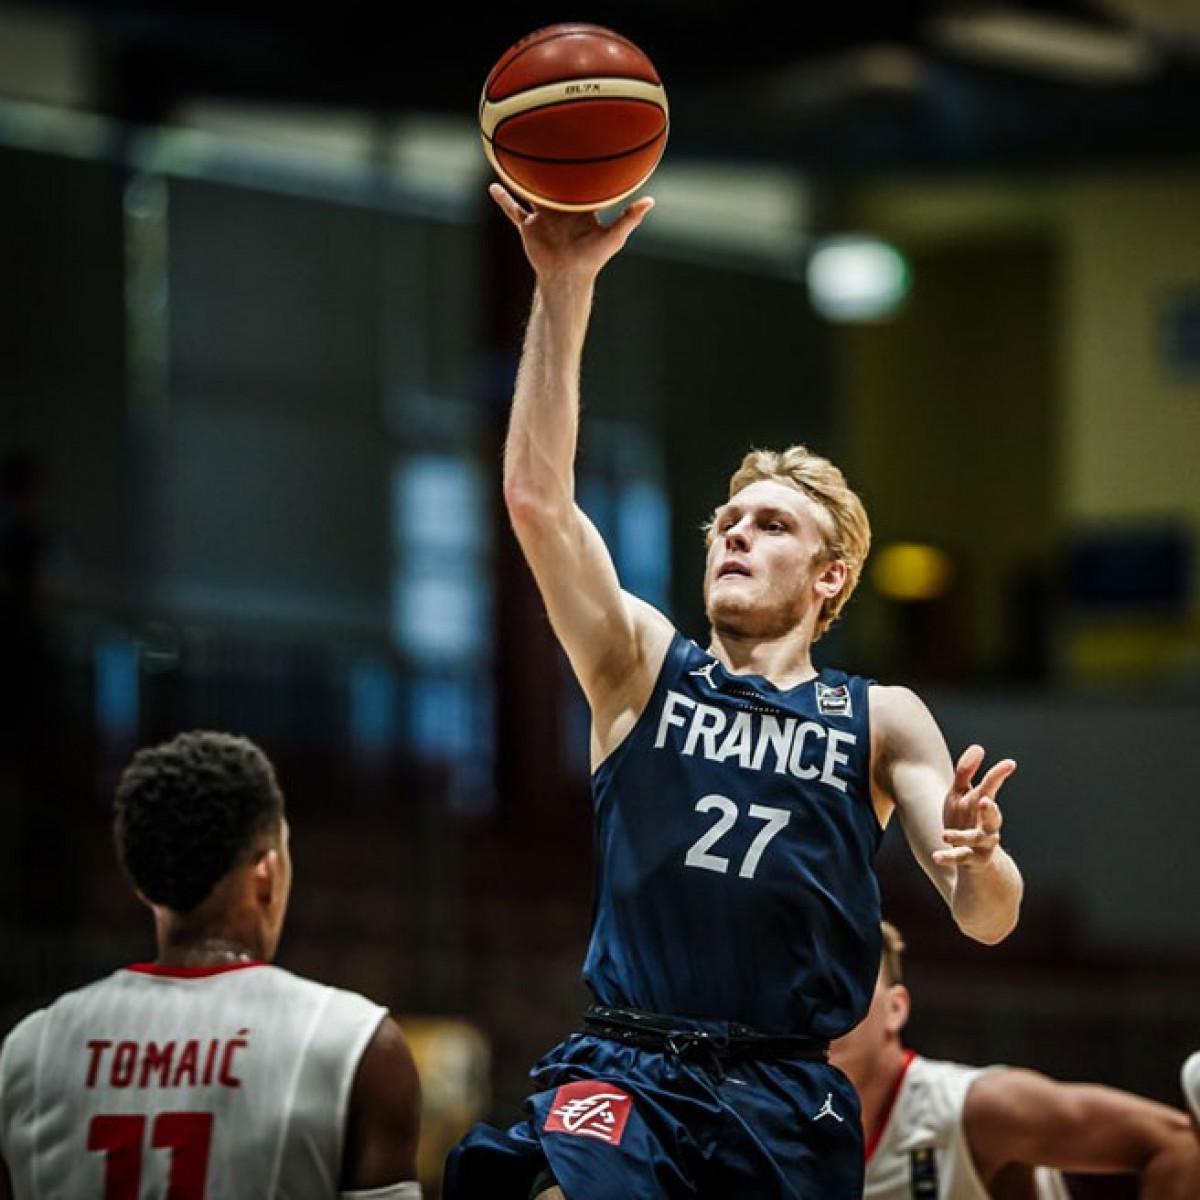 Photo of Thibault Desseignet, 2018-2019 season